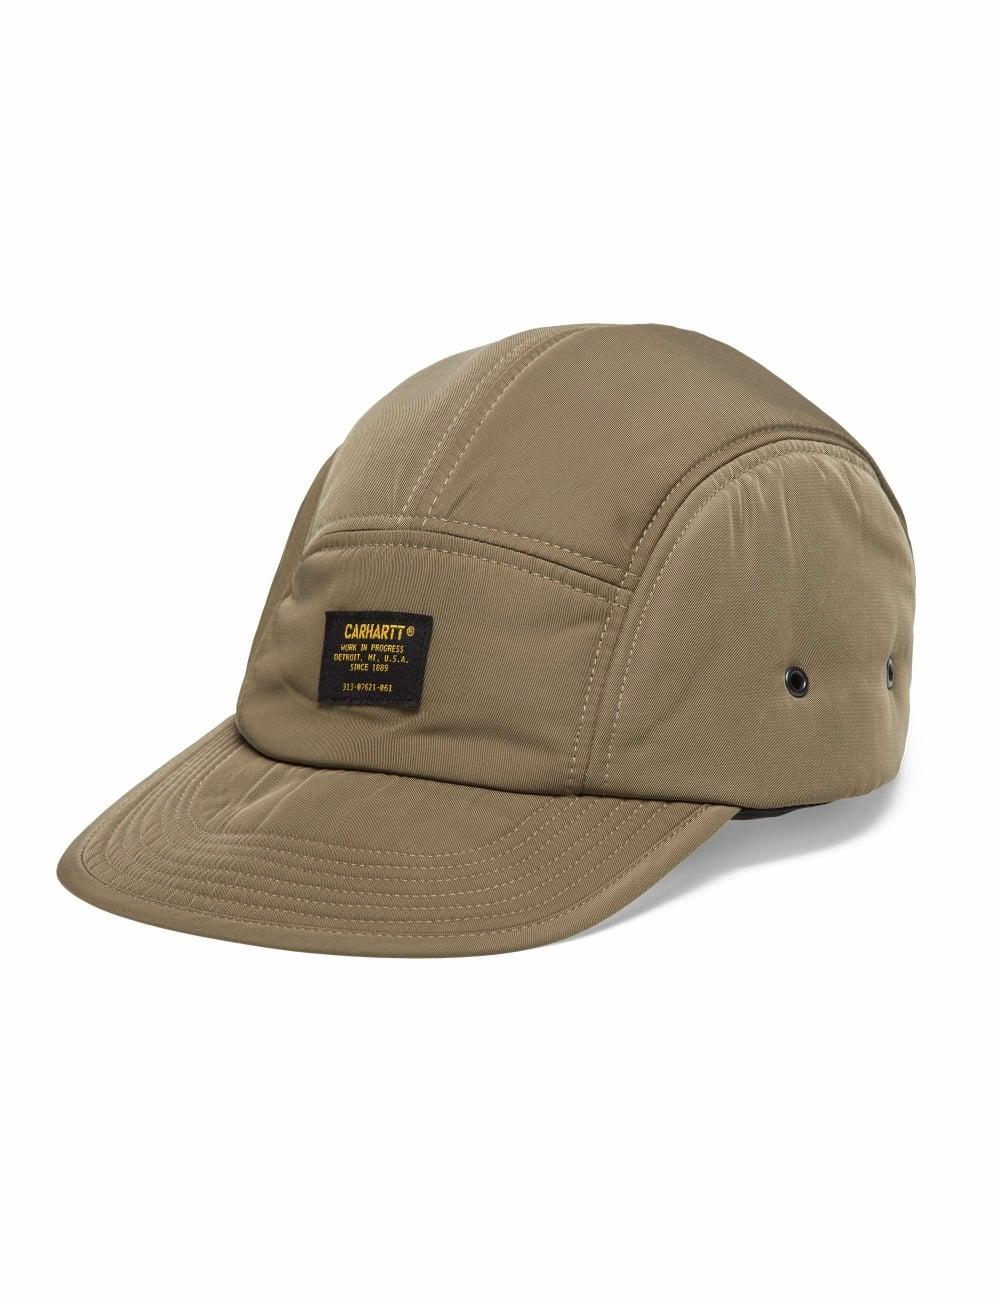 421496e87a91f Carhartt WIP Military Logo Cap - Tundra - Accessories from Fat ...